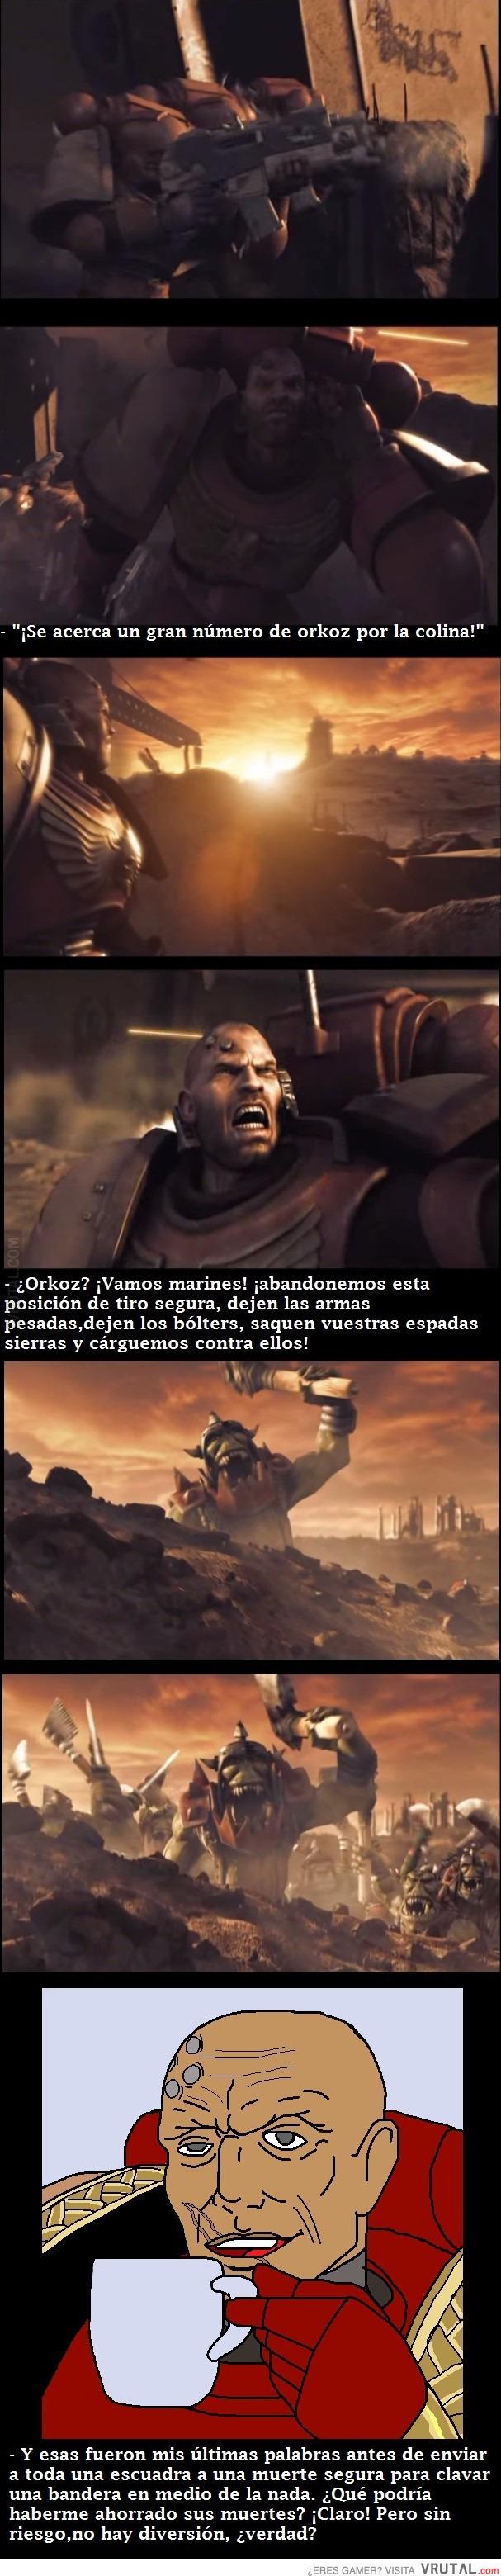 Humor & Warhammer VRU_14826_la_logica_en_la_intro_del_warhammer_40k_dawn_of_war